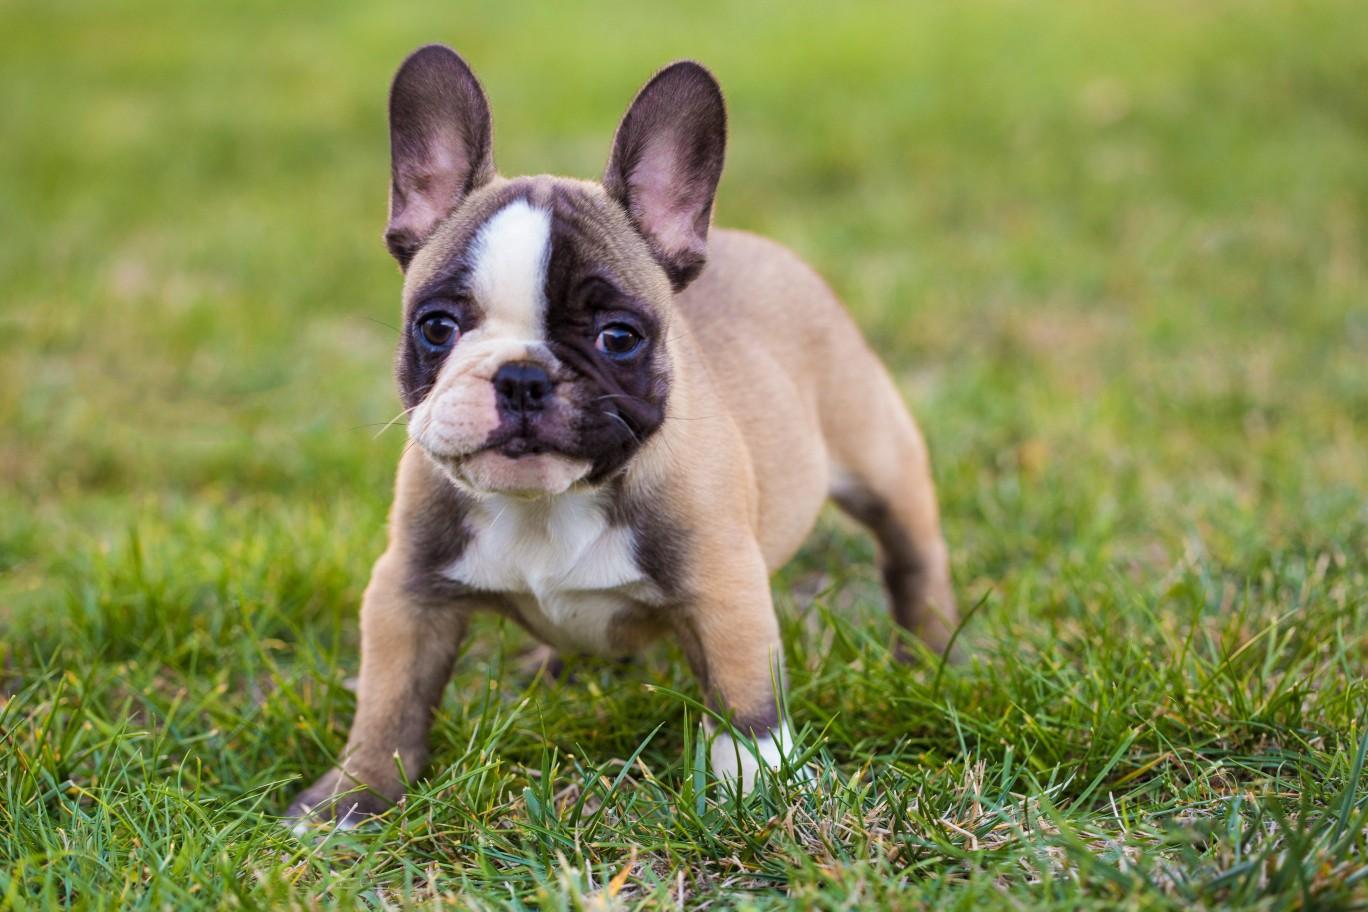 A puppy in a field